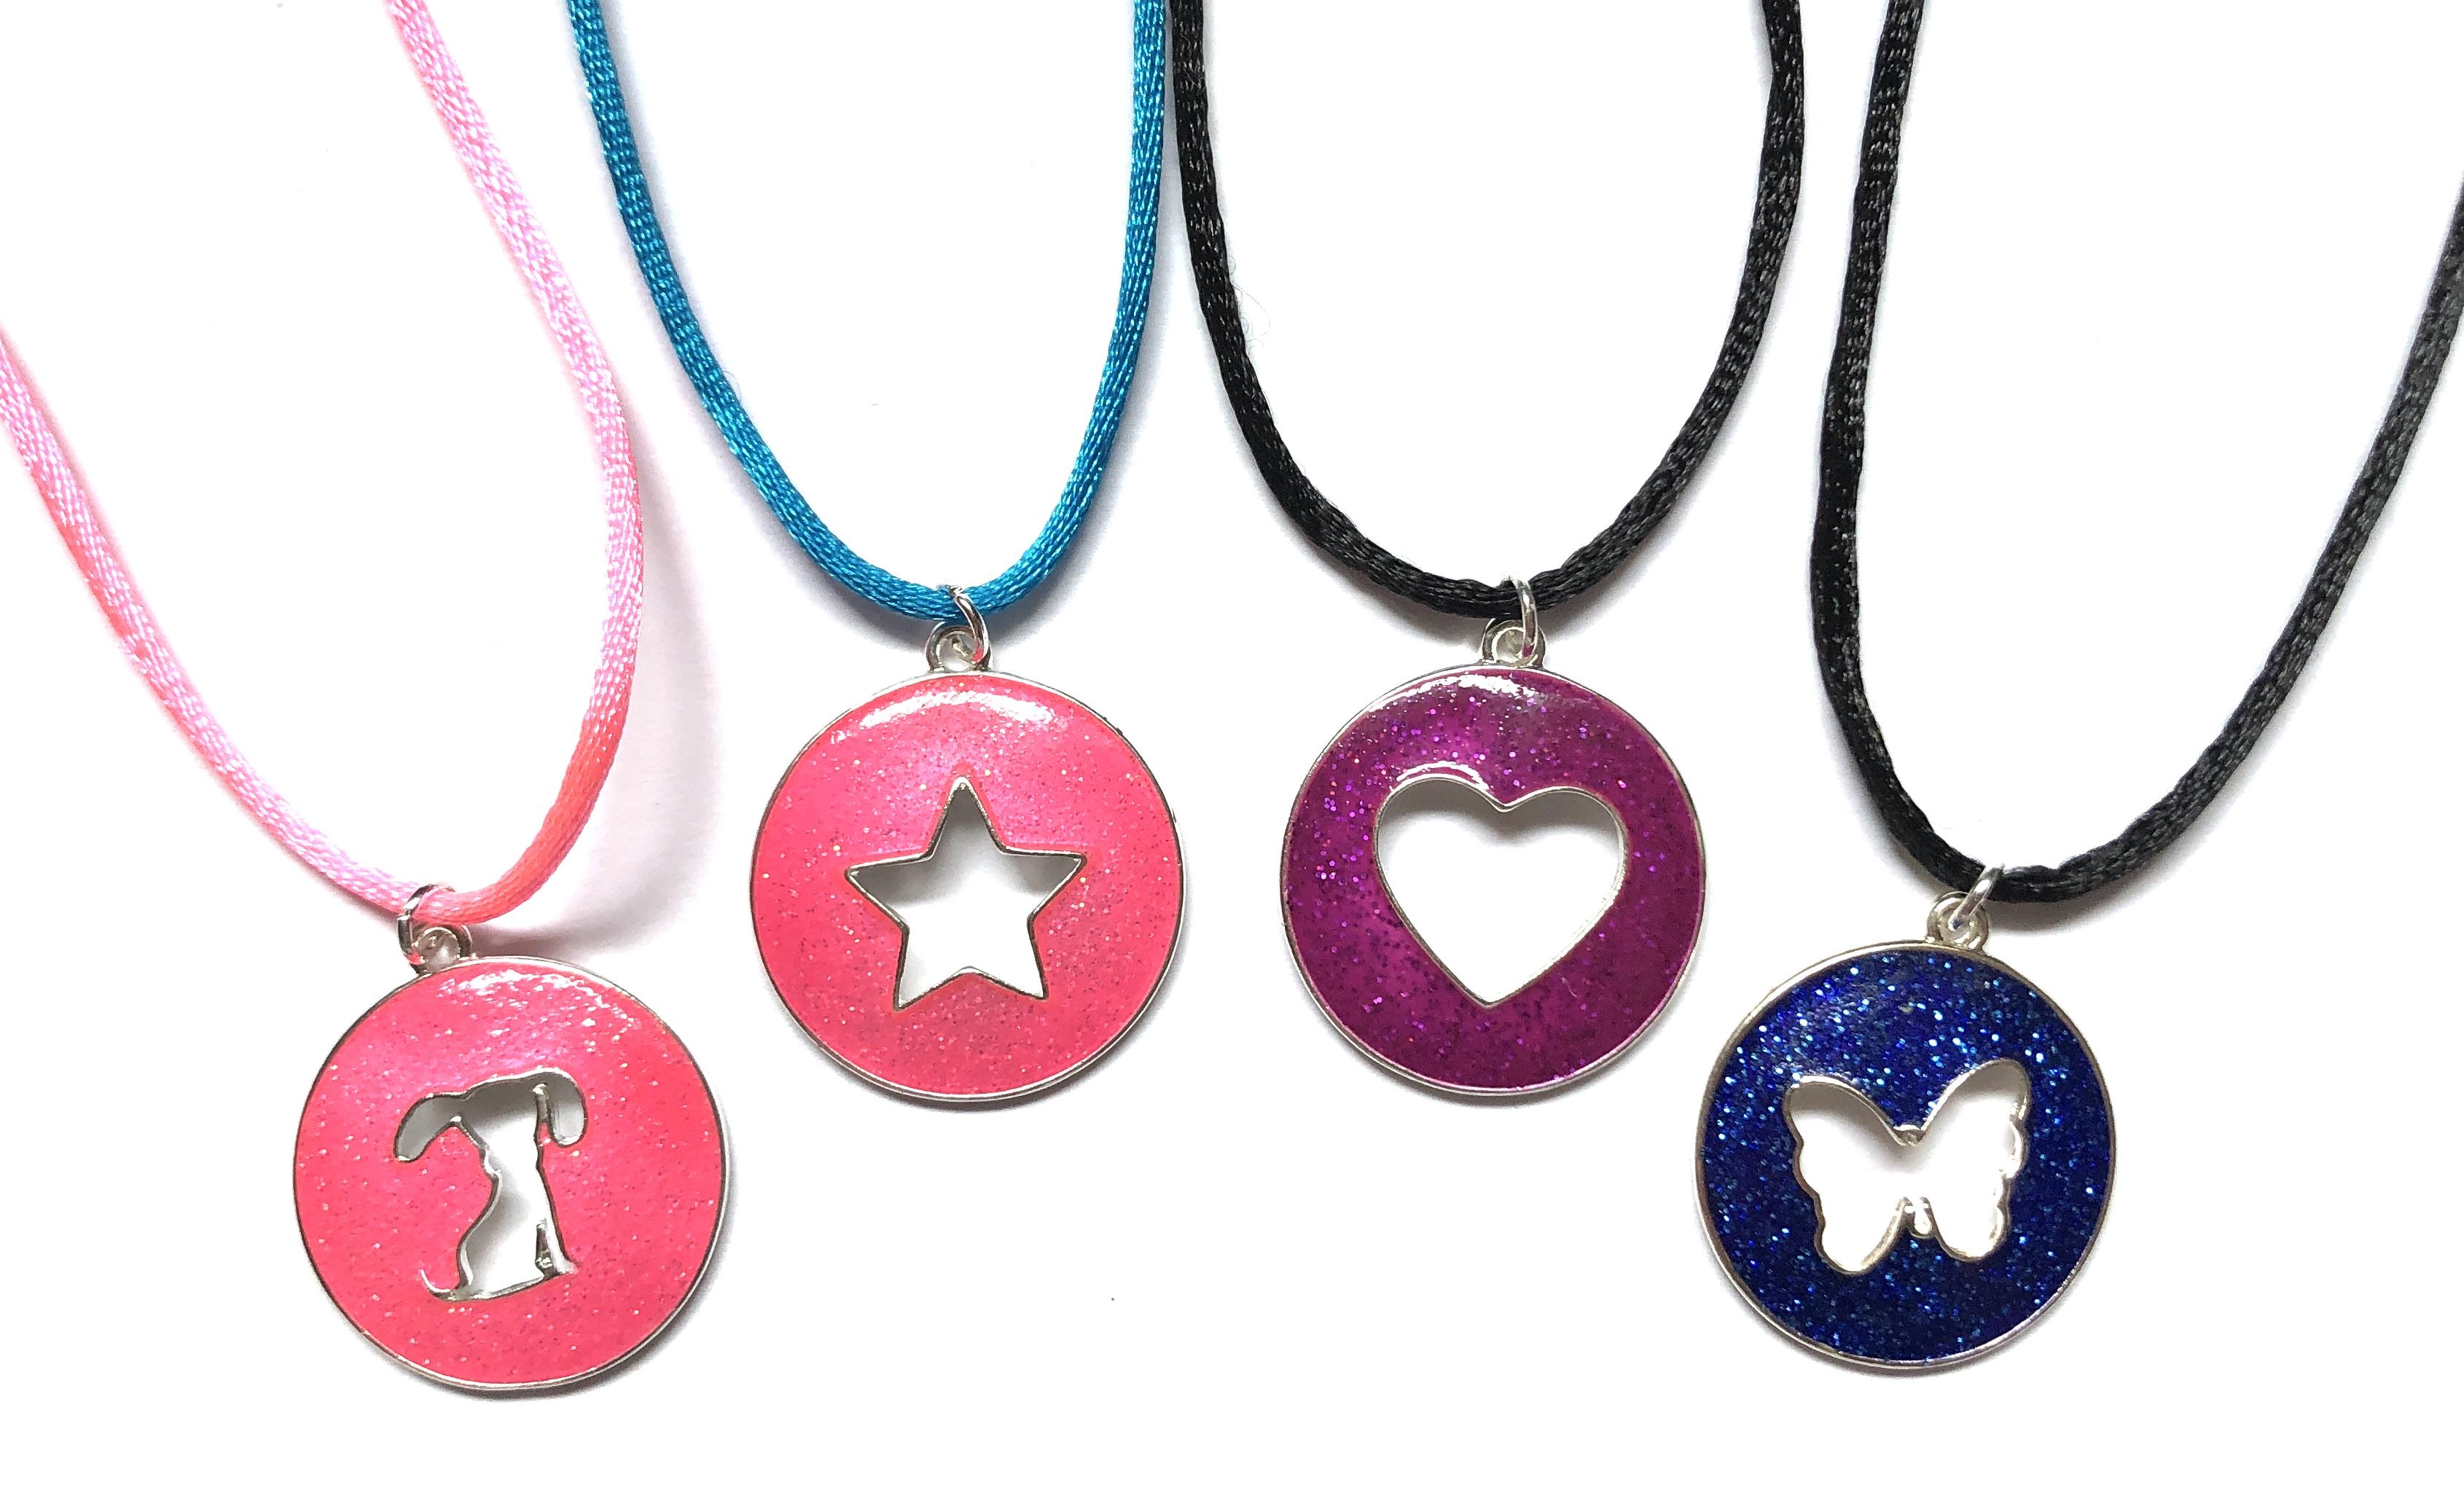 Cute Cut-Out Necklaces